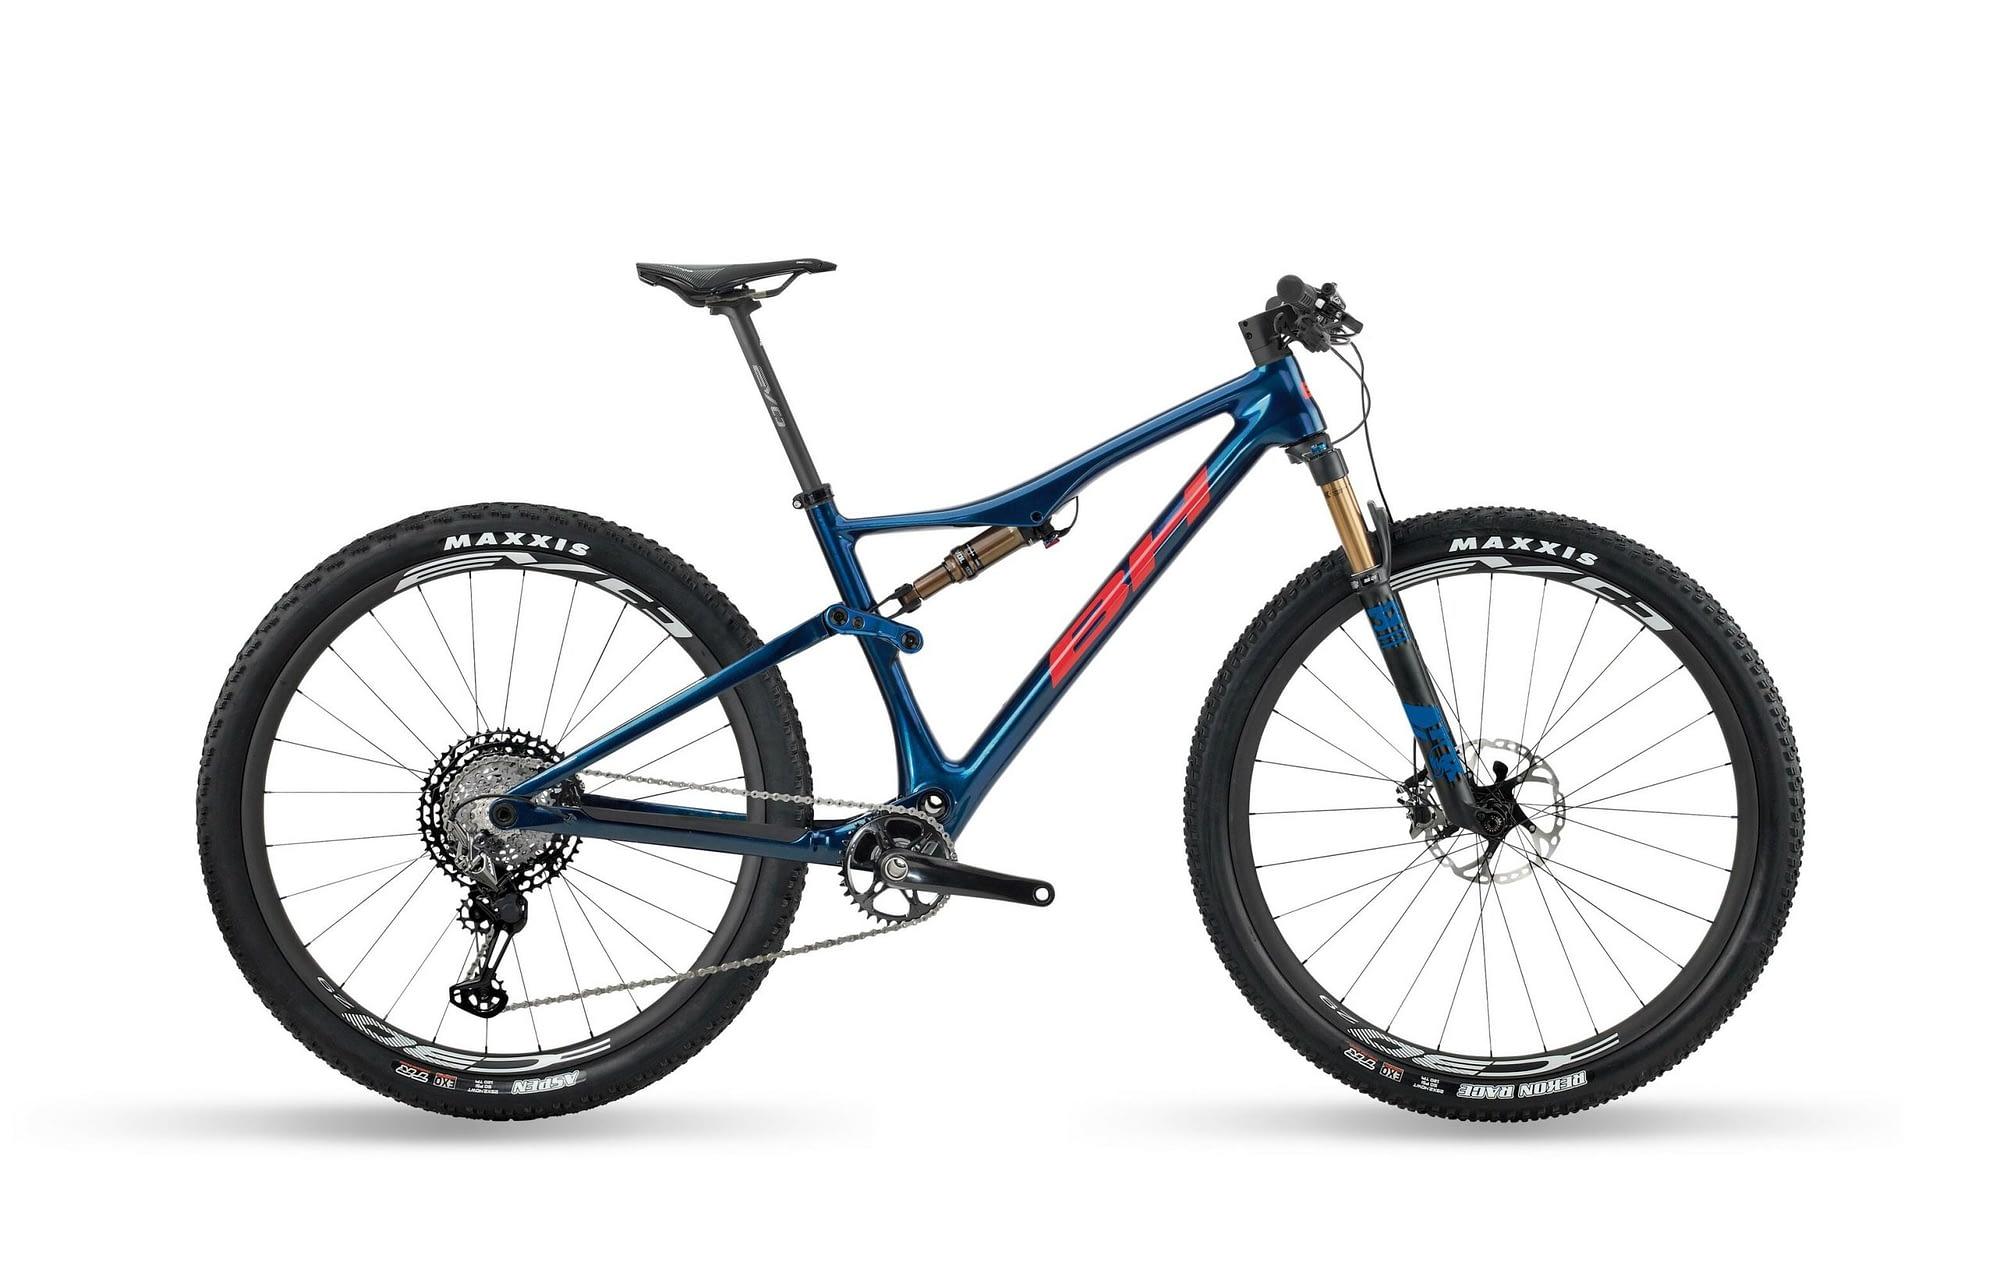 BH LYNX RACE EVO CARBON 9.5 - Rouge / Bleu, XL